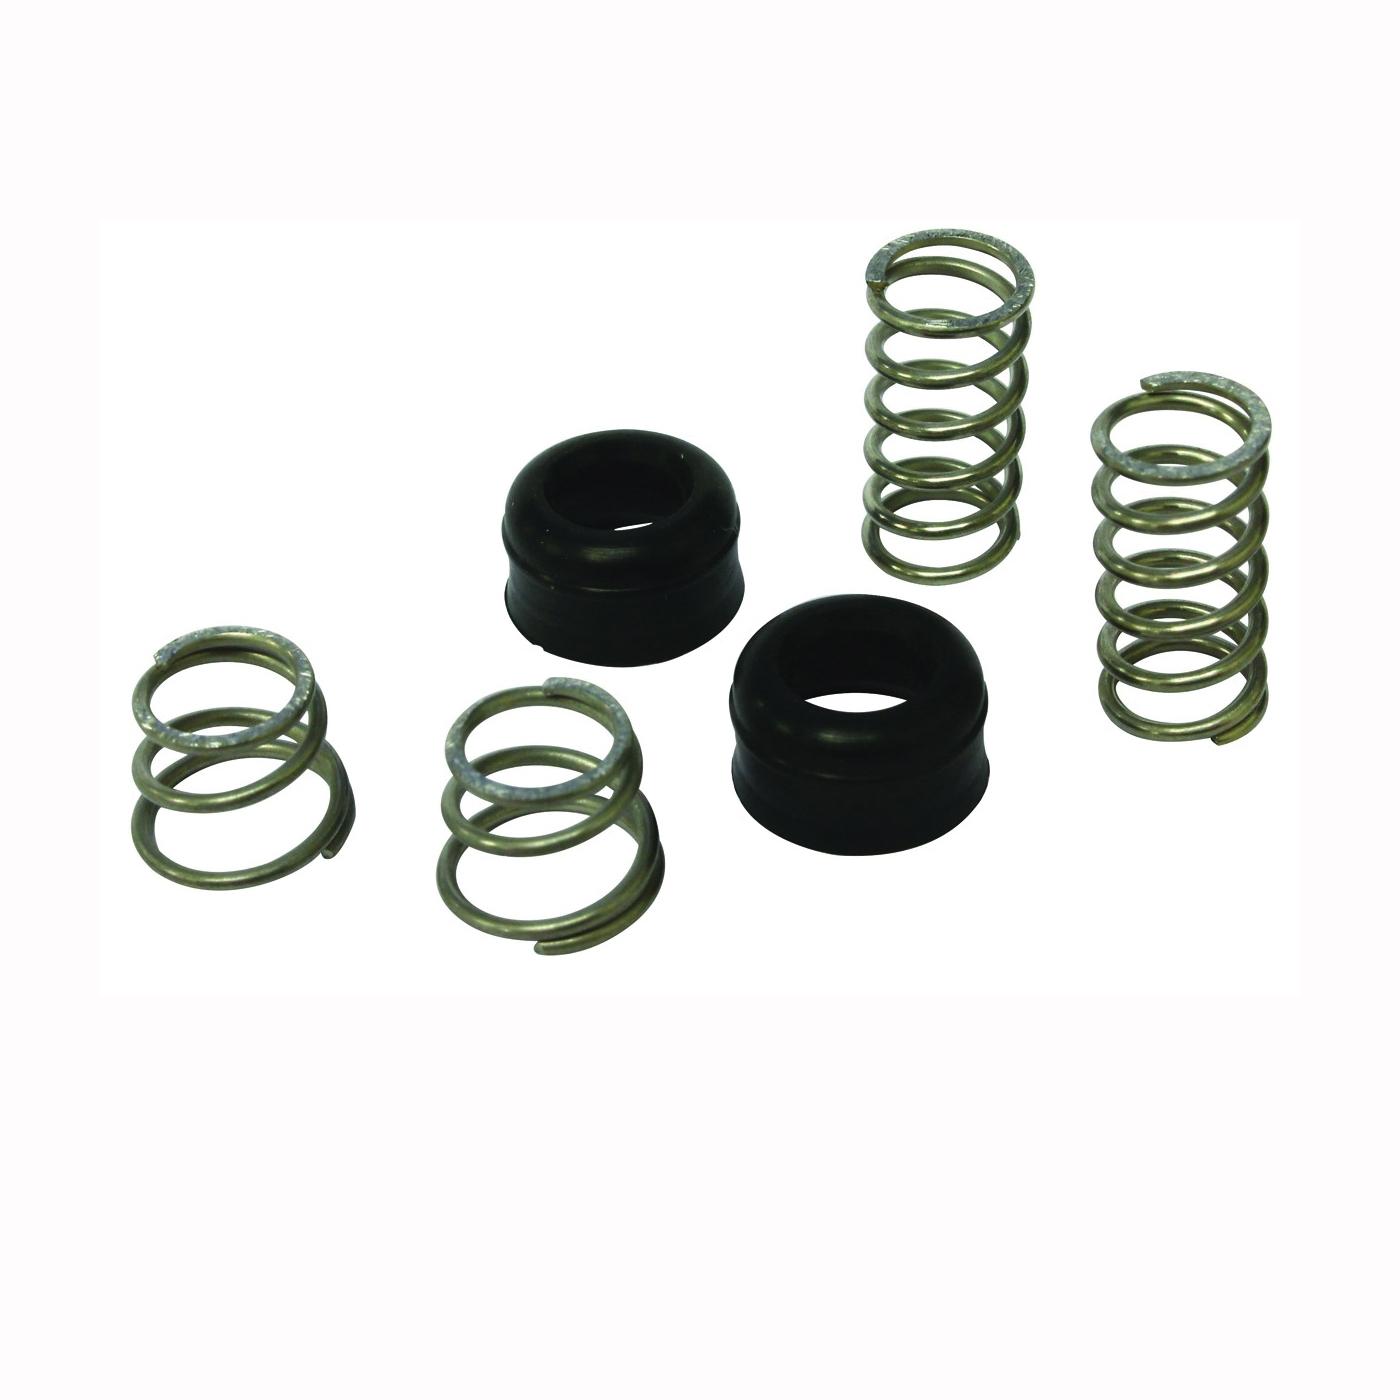 Picture of Plumb Pak PP20852 Faucet Repair Kit, For: Delta Single-Lever Style Spouts